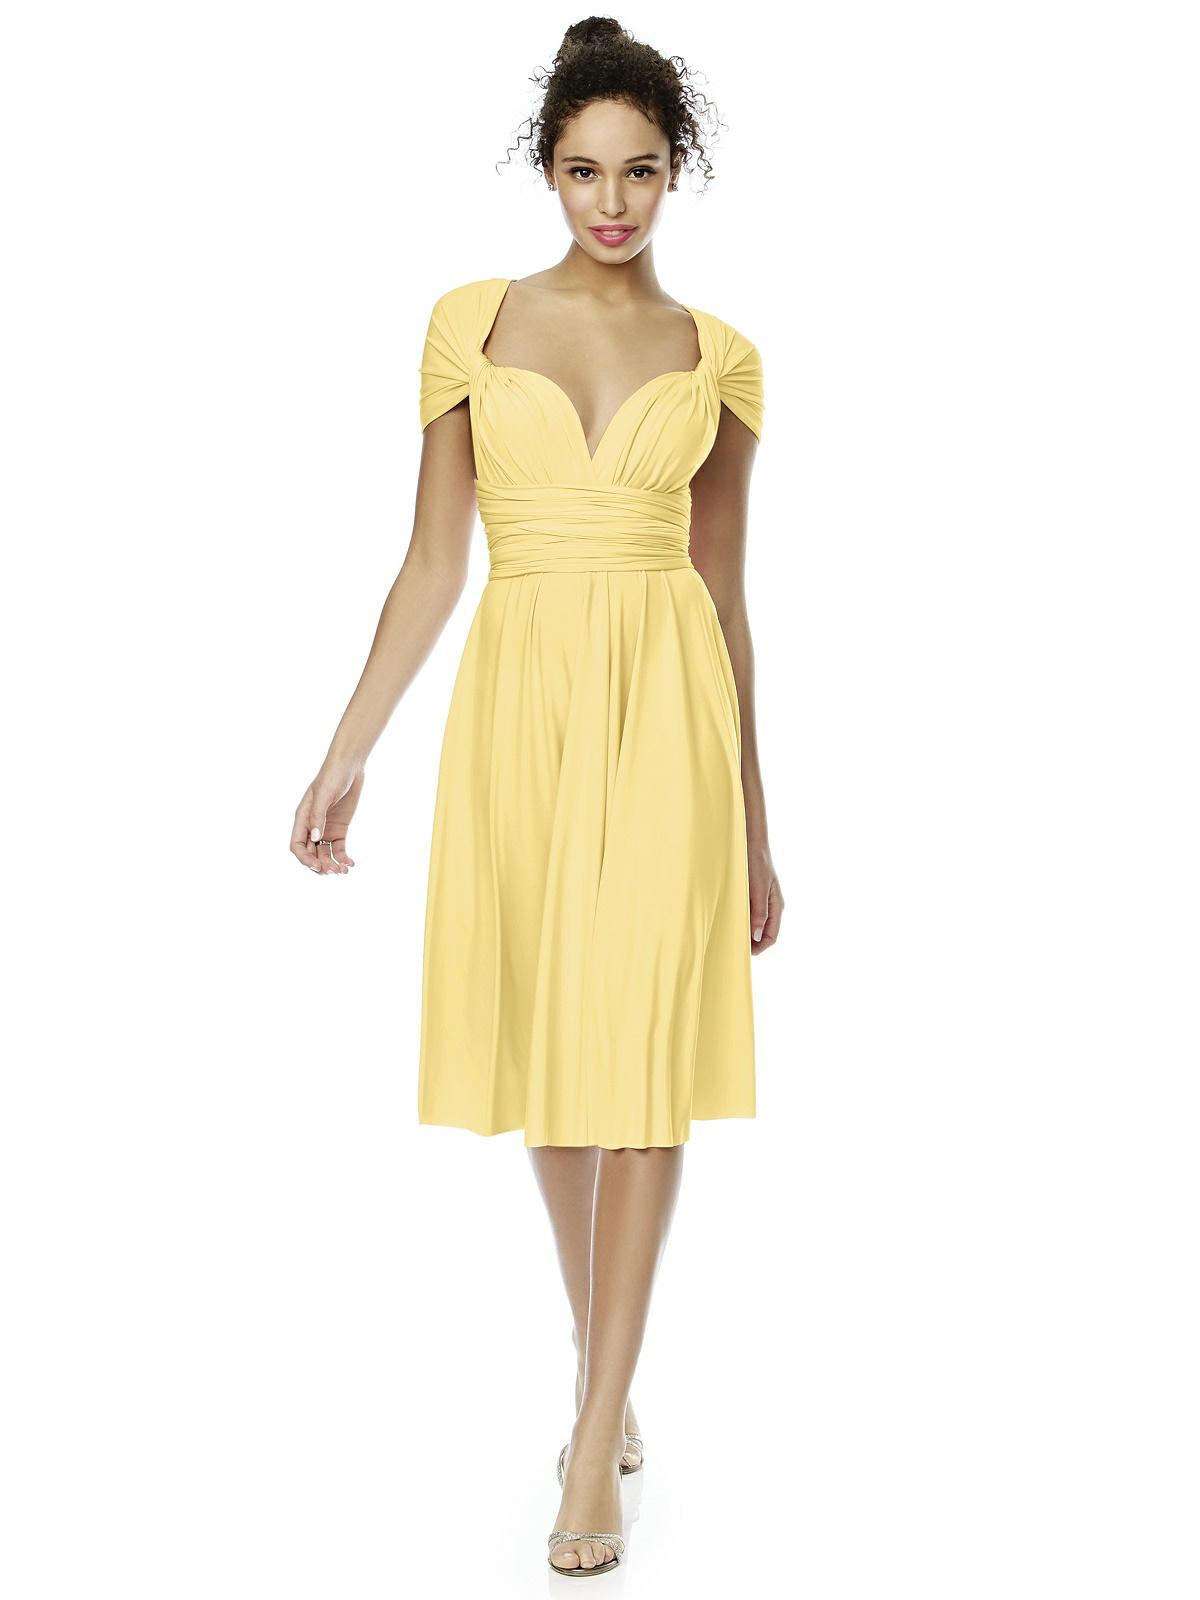 Convertible Dress The Twist Wrap Dress Short The Dessy